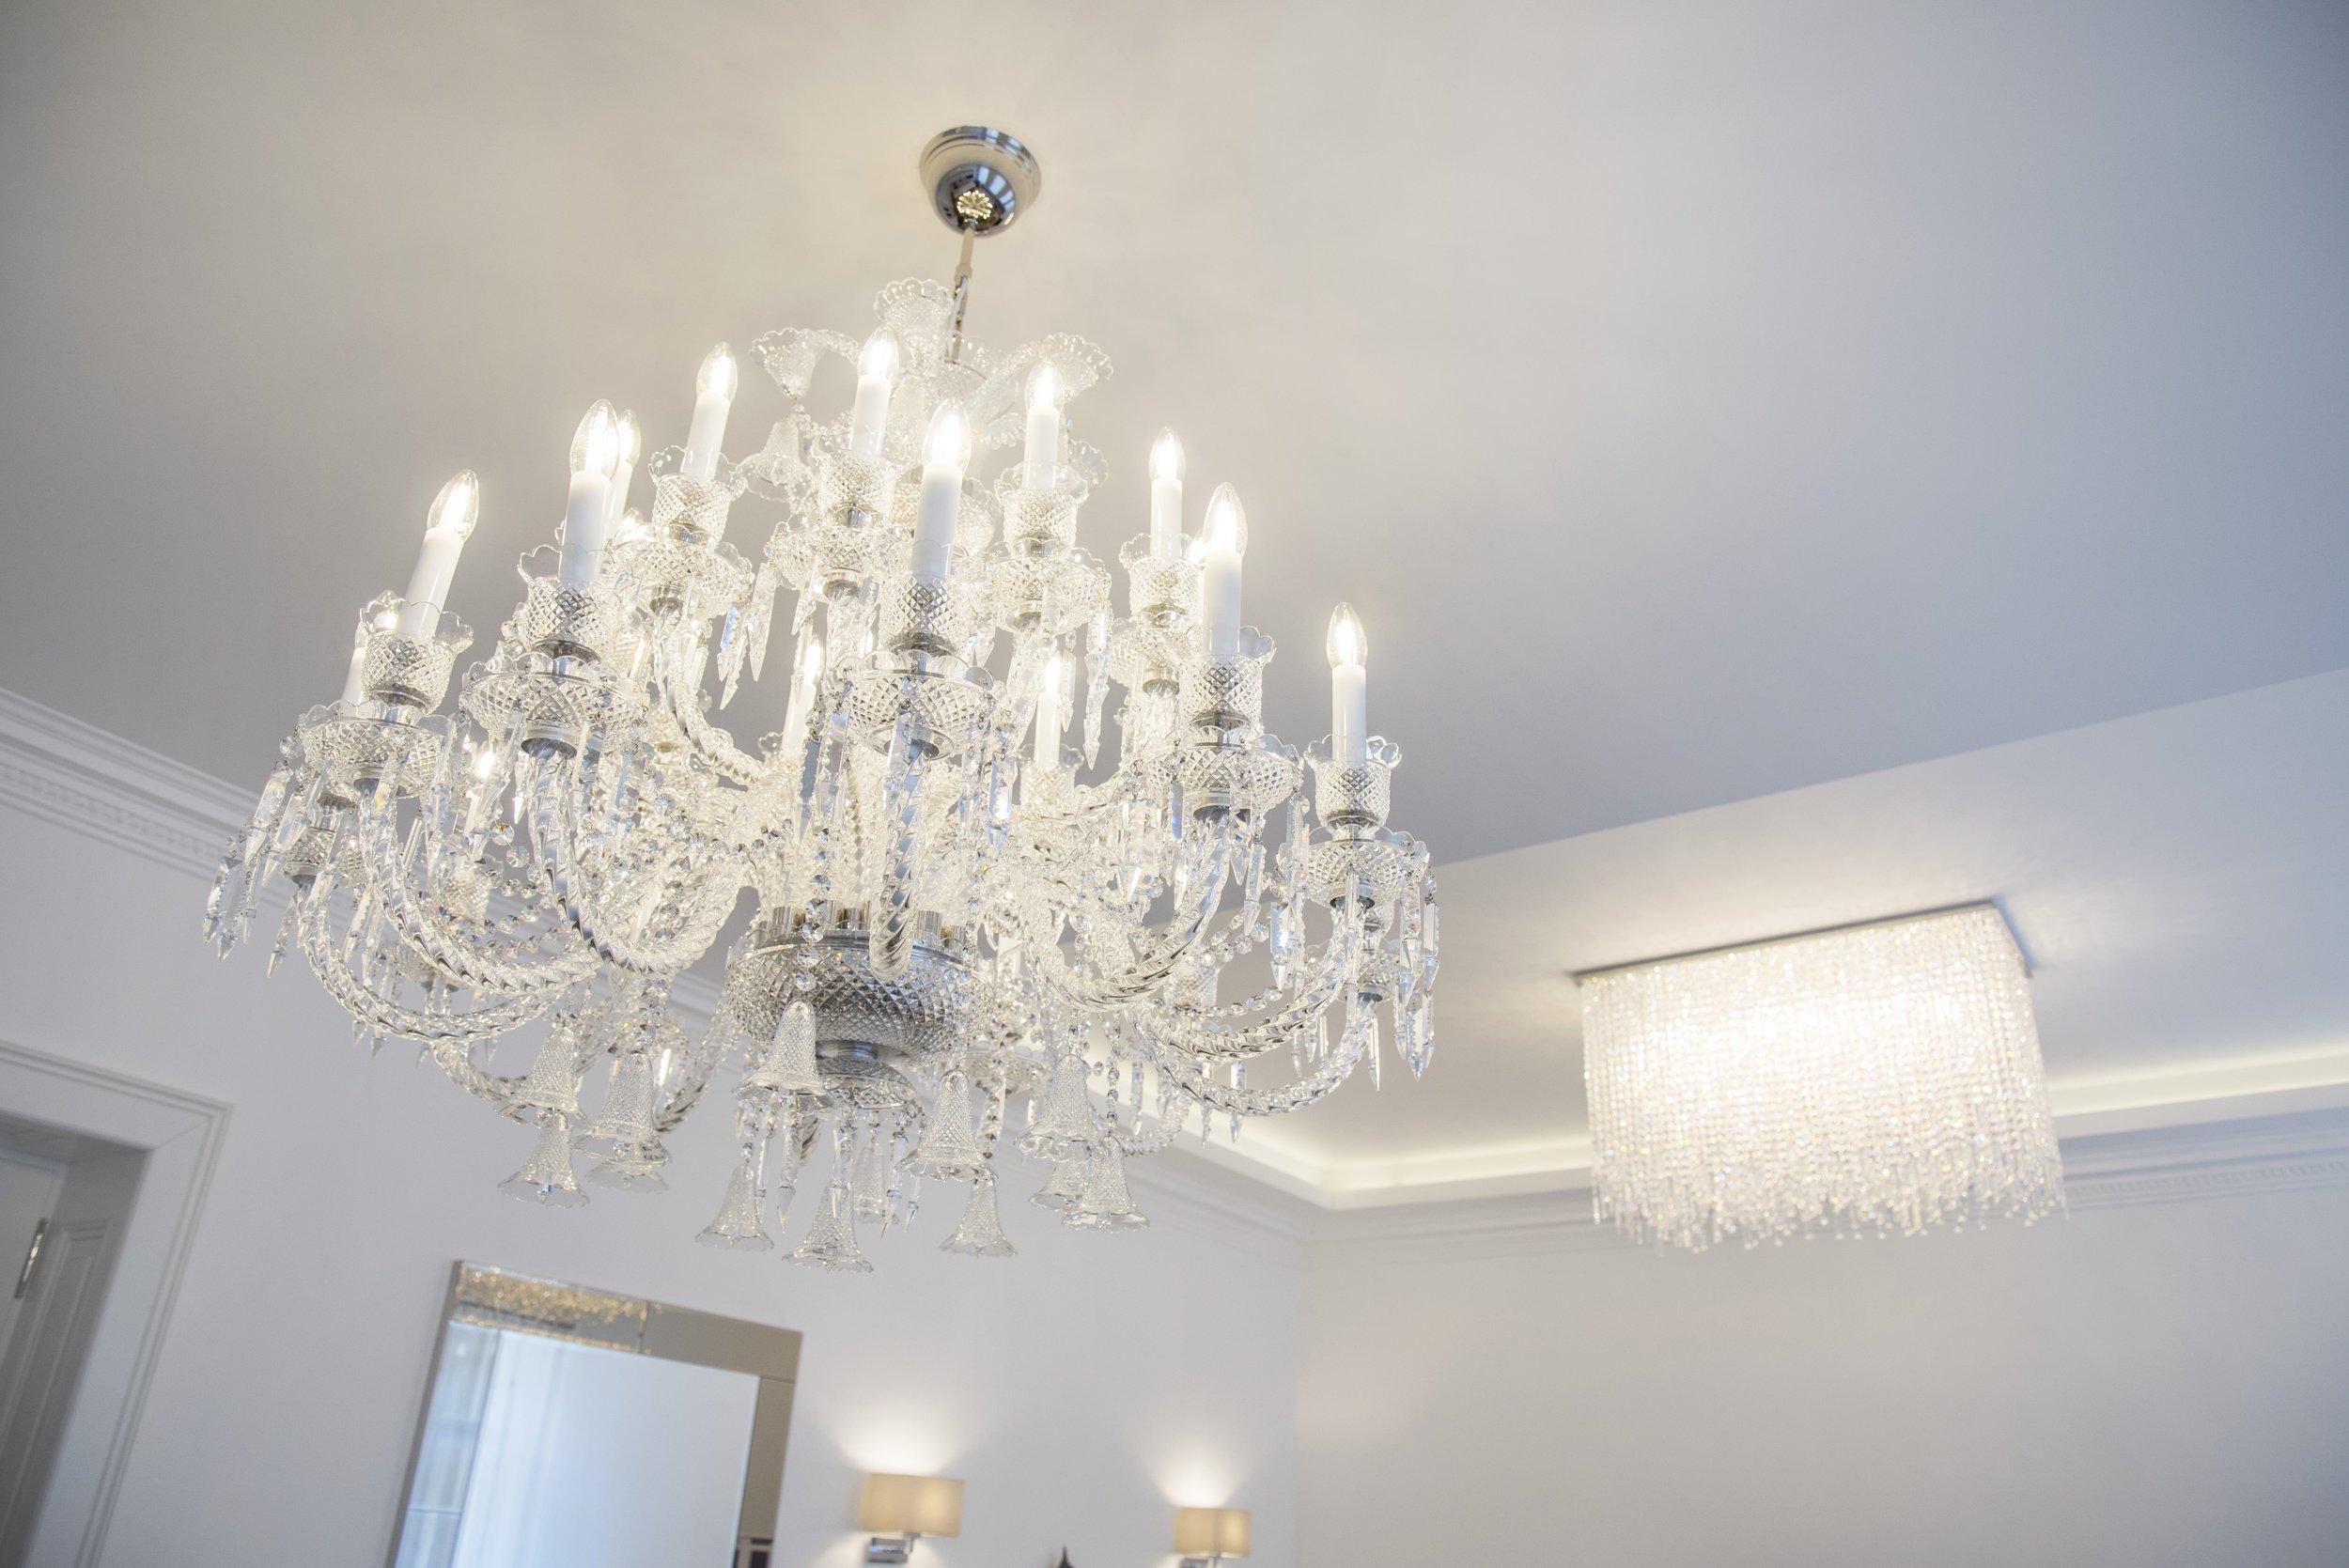 apartment-modern-wranovsky-crystal-chandeliers-2.jpg